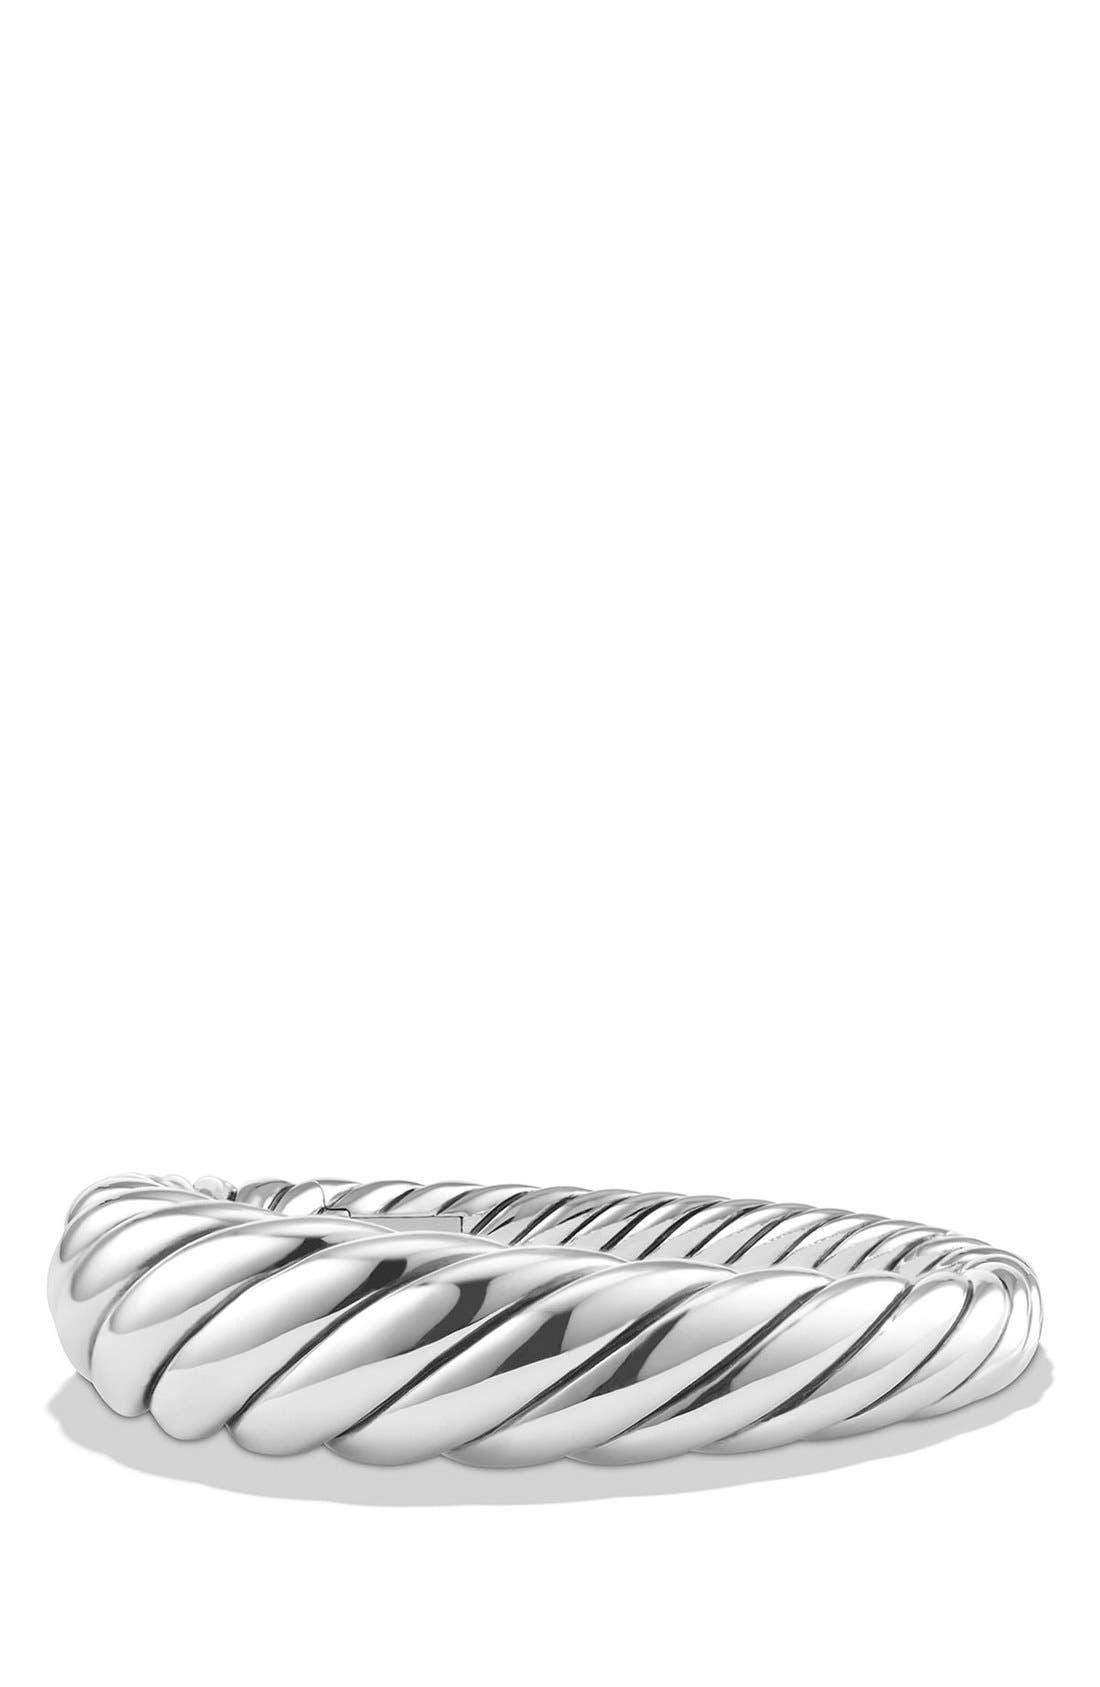 Main Image - David Yurman 'Pure Form' Cable Bracelet